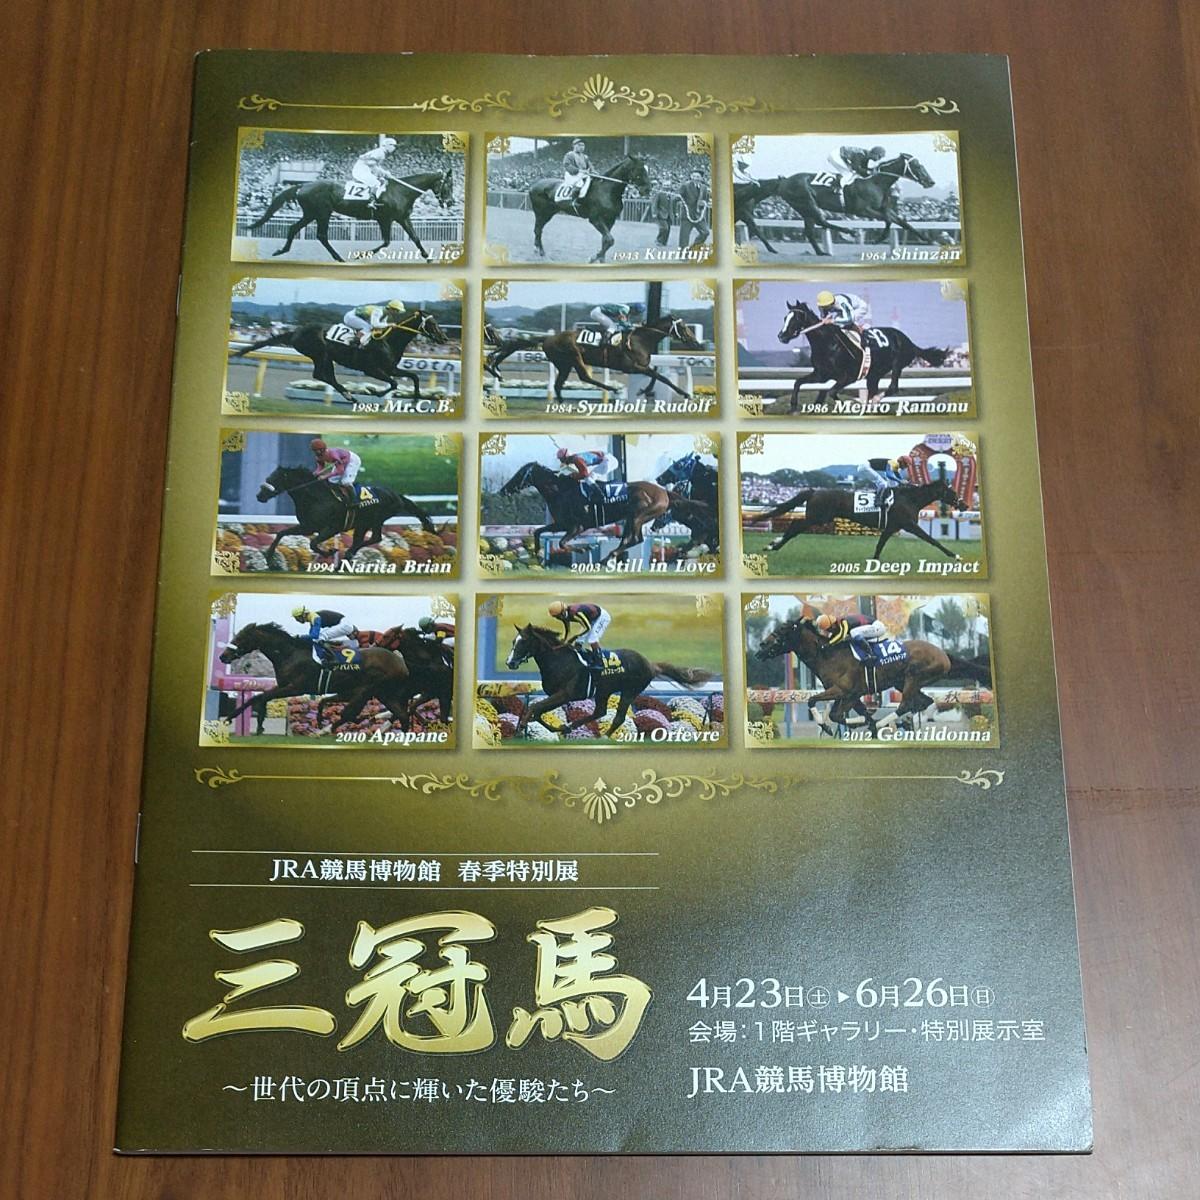 JRA競馬博物館 三冠馬展 パンフレット